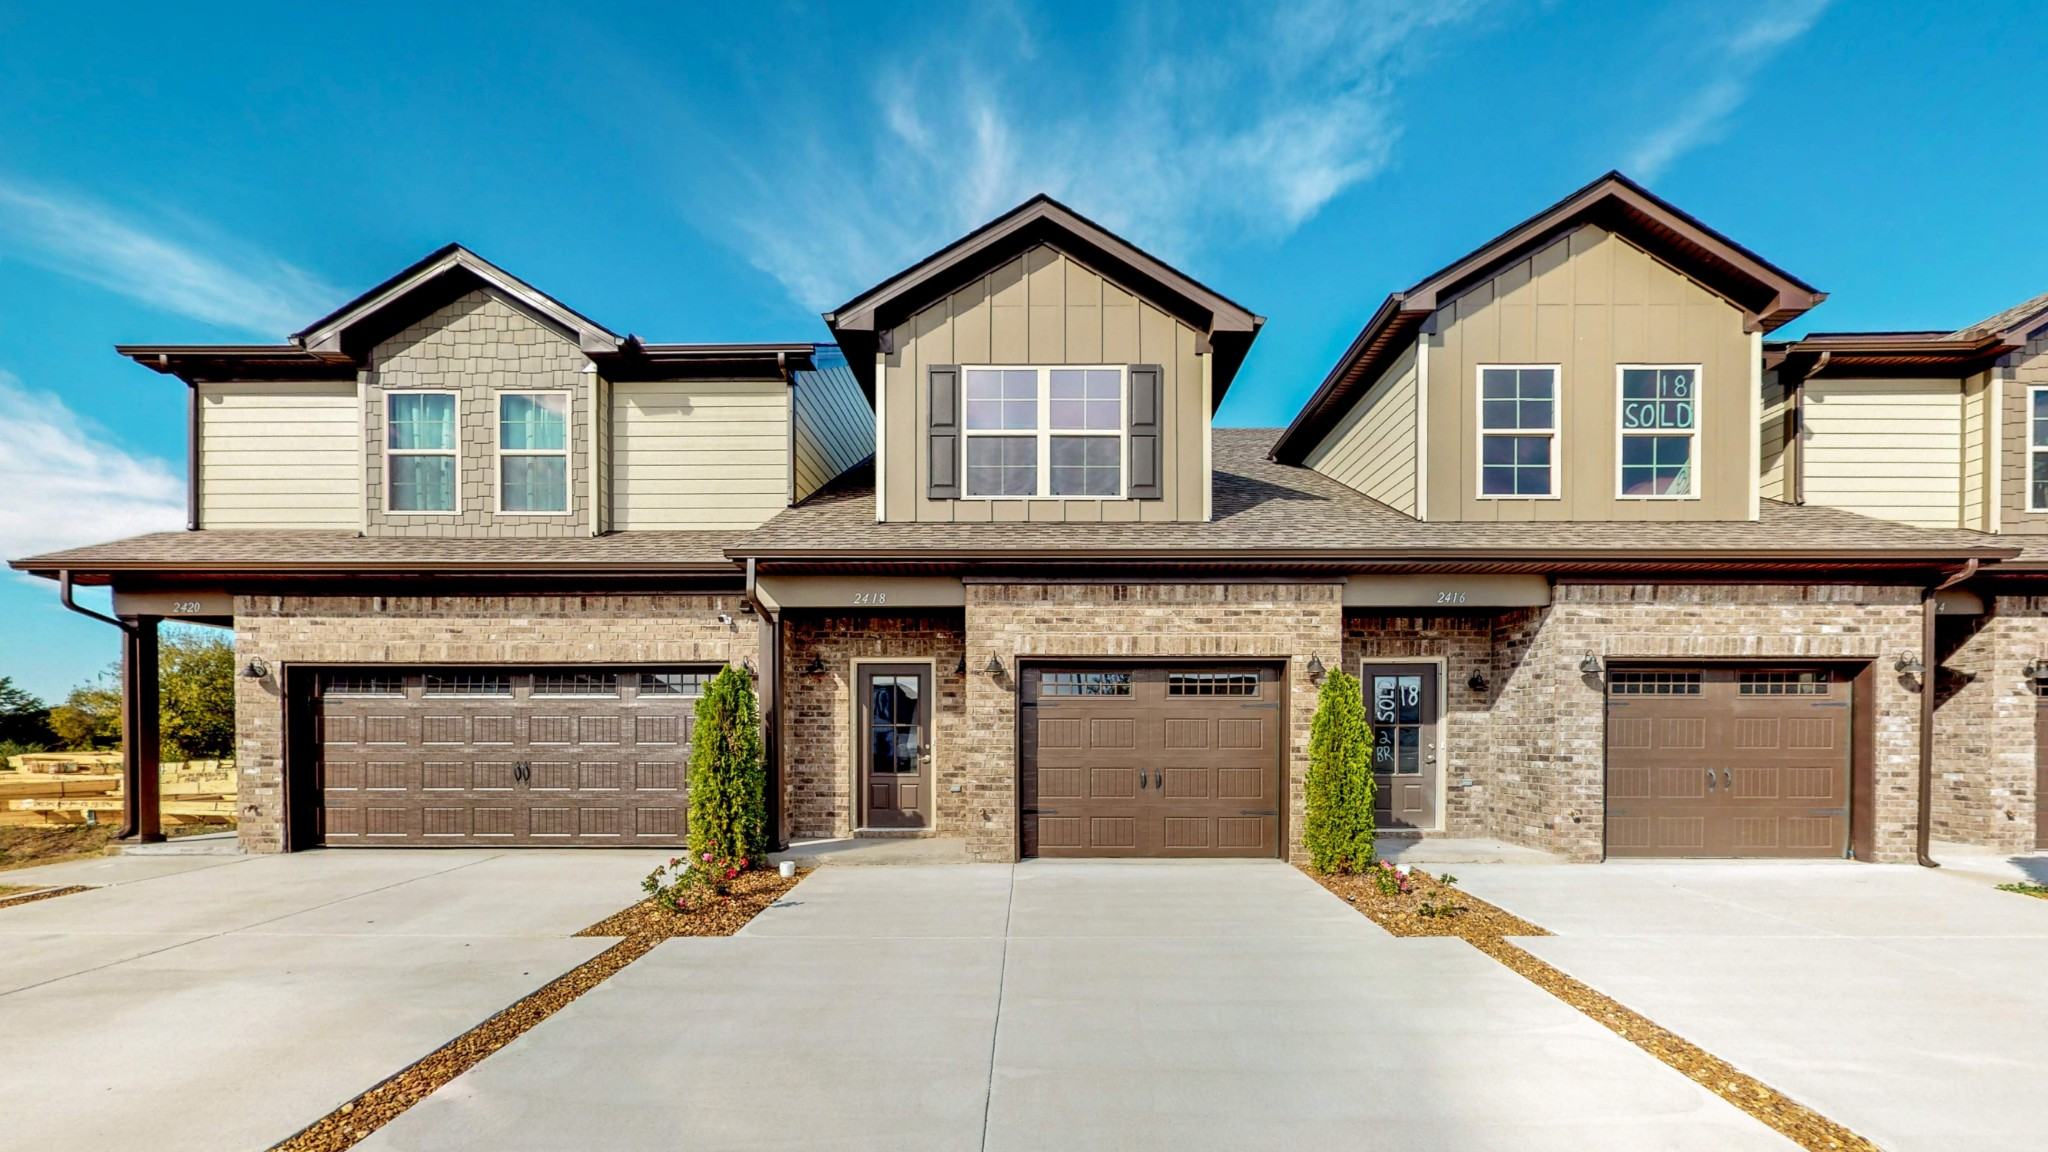 2412 Lightbend Dr - Lot 16, Murfreesboro, TN 37127 - Murfreesboro, TN real estate listing